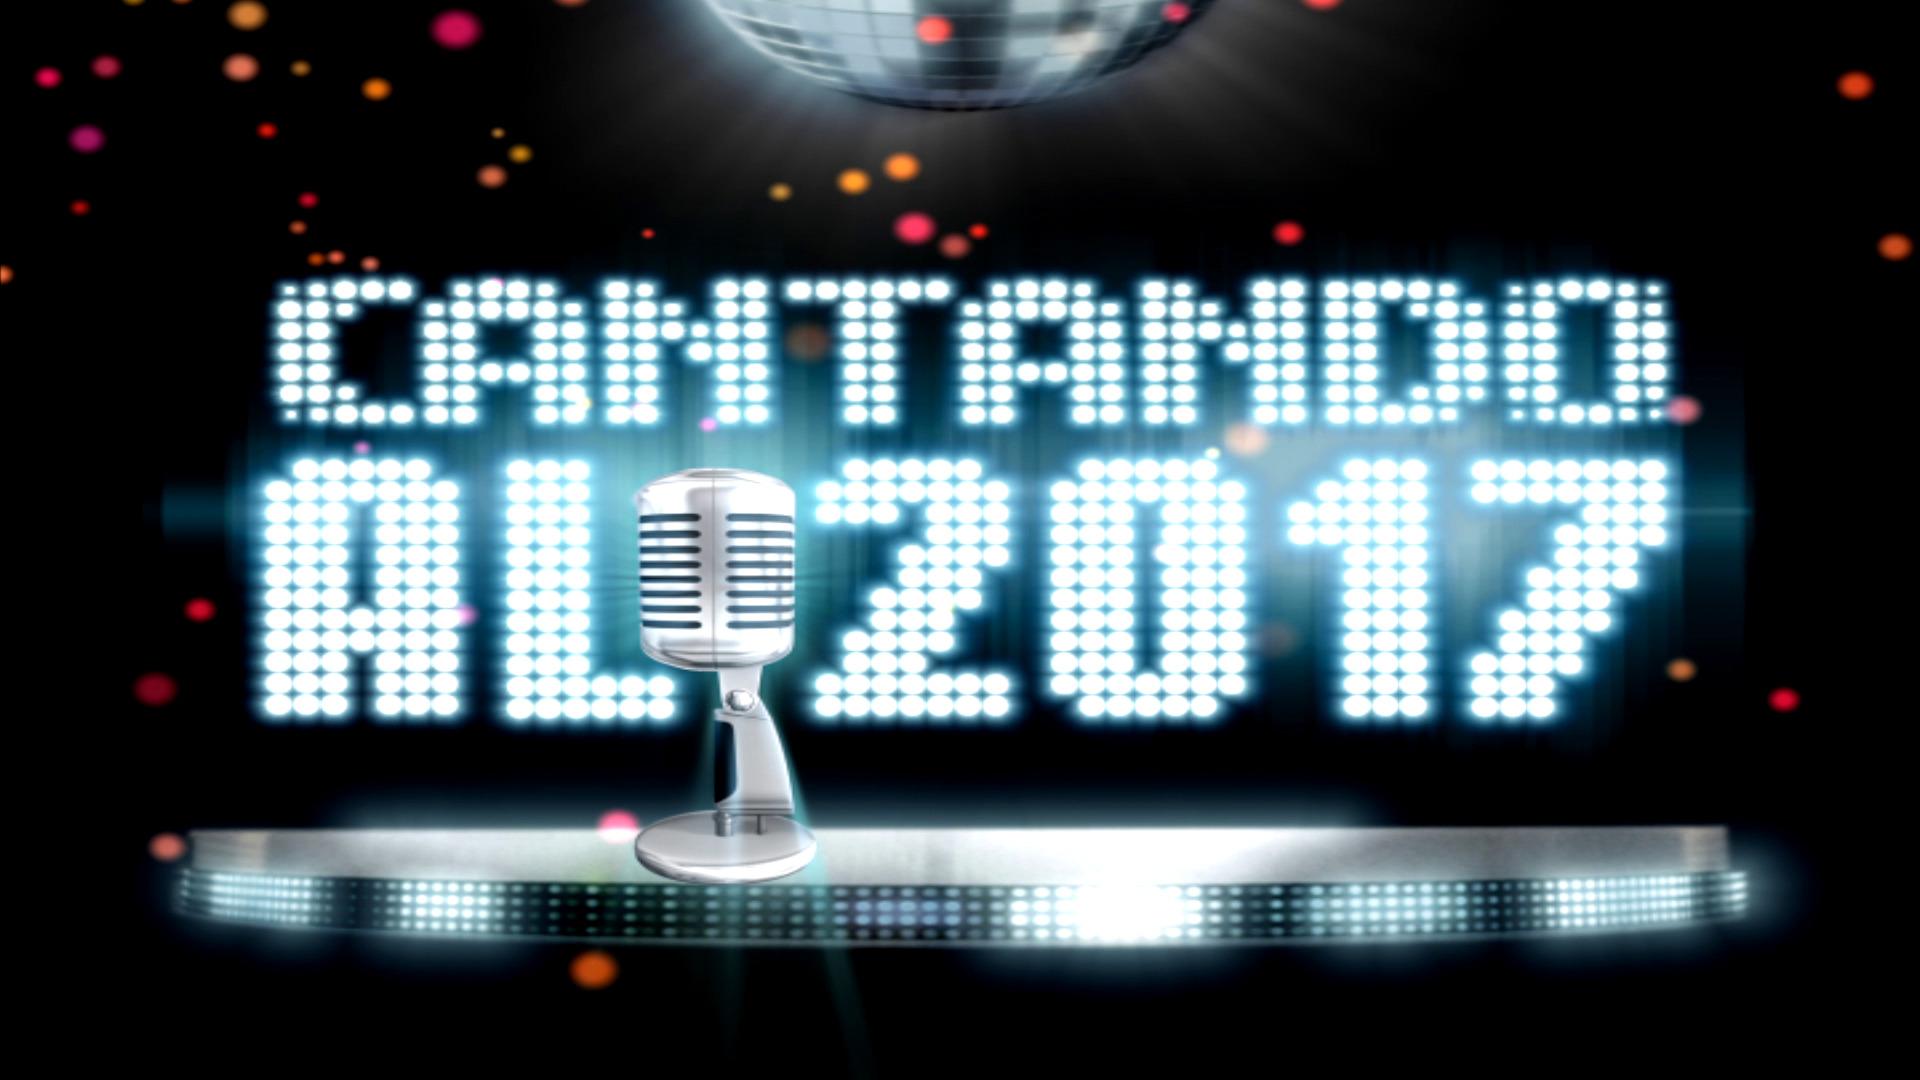 Temporada Cantando al 2017: Especial Nochevieja